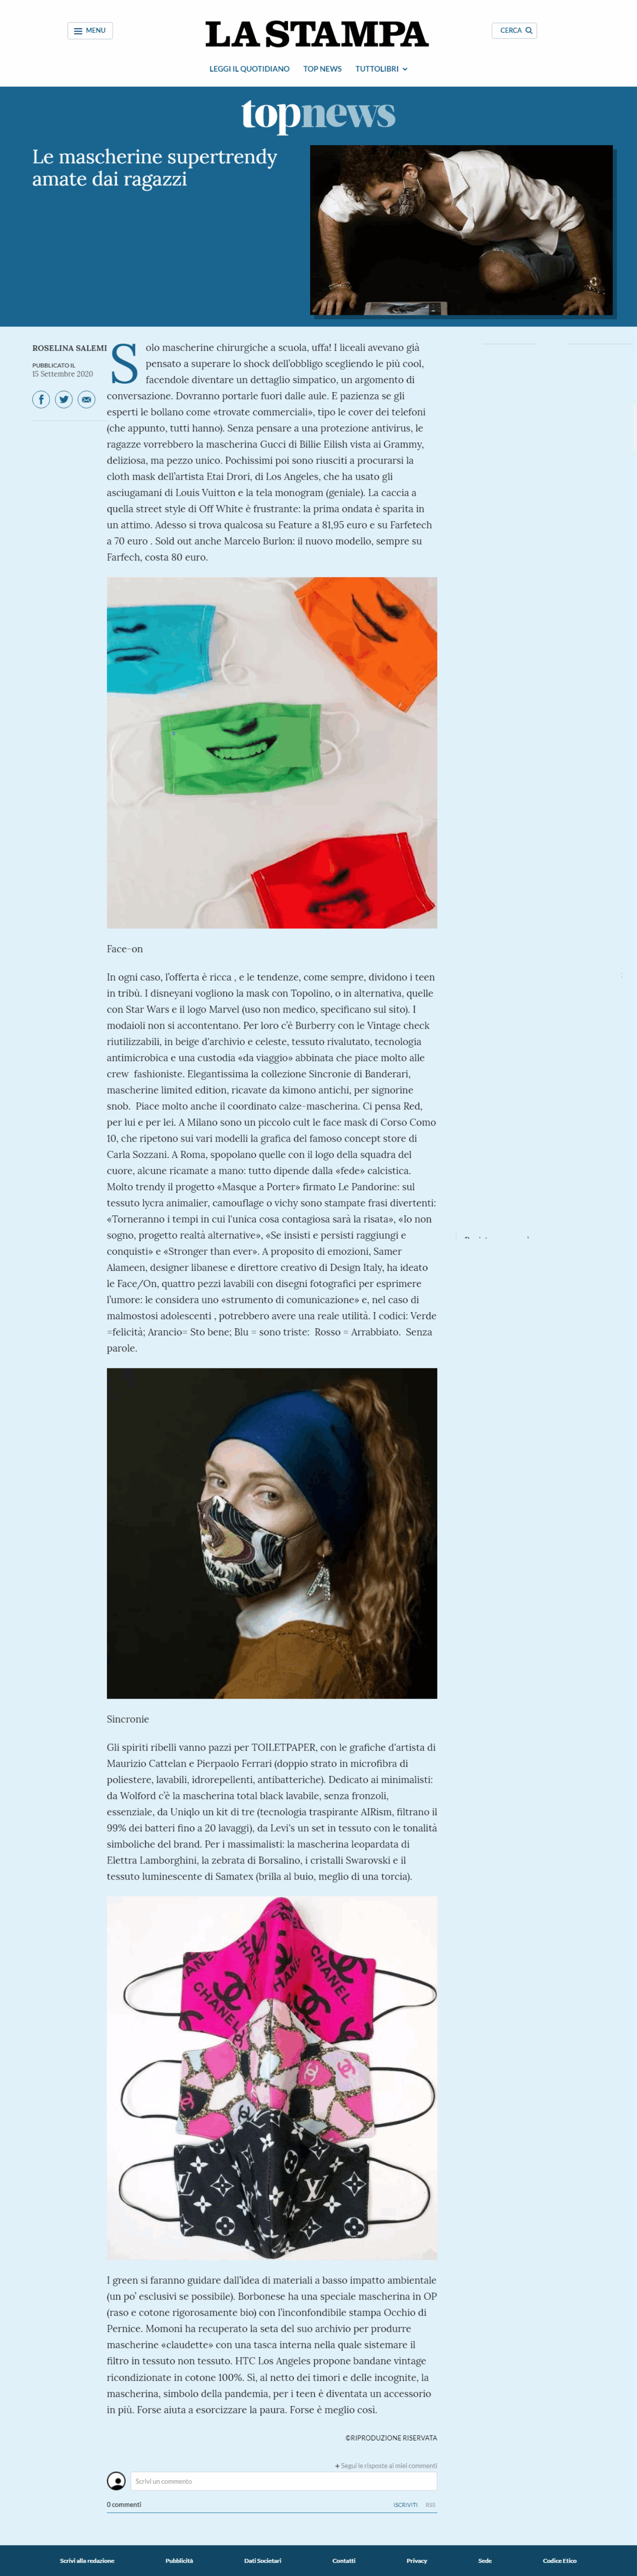 la-stampa-mascherine-banderari